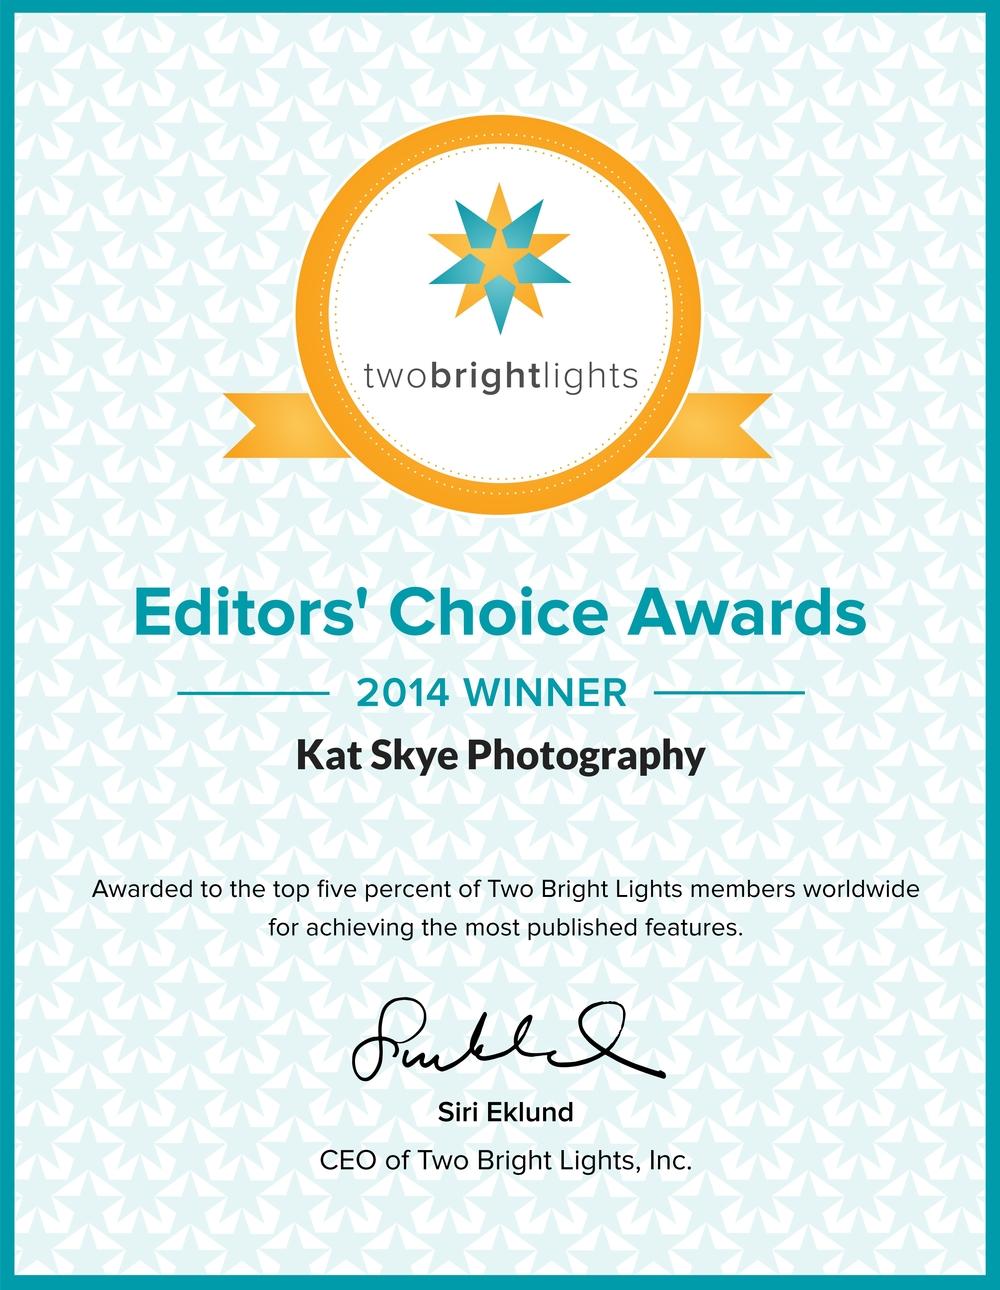 award2014certificate-1.jpg